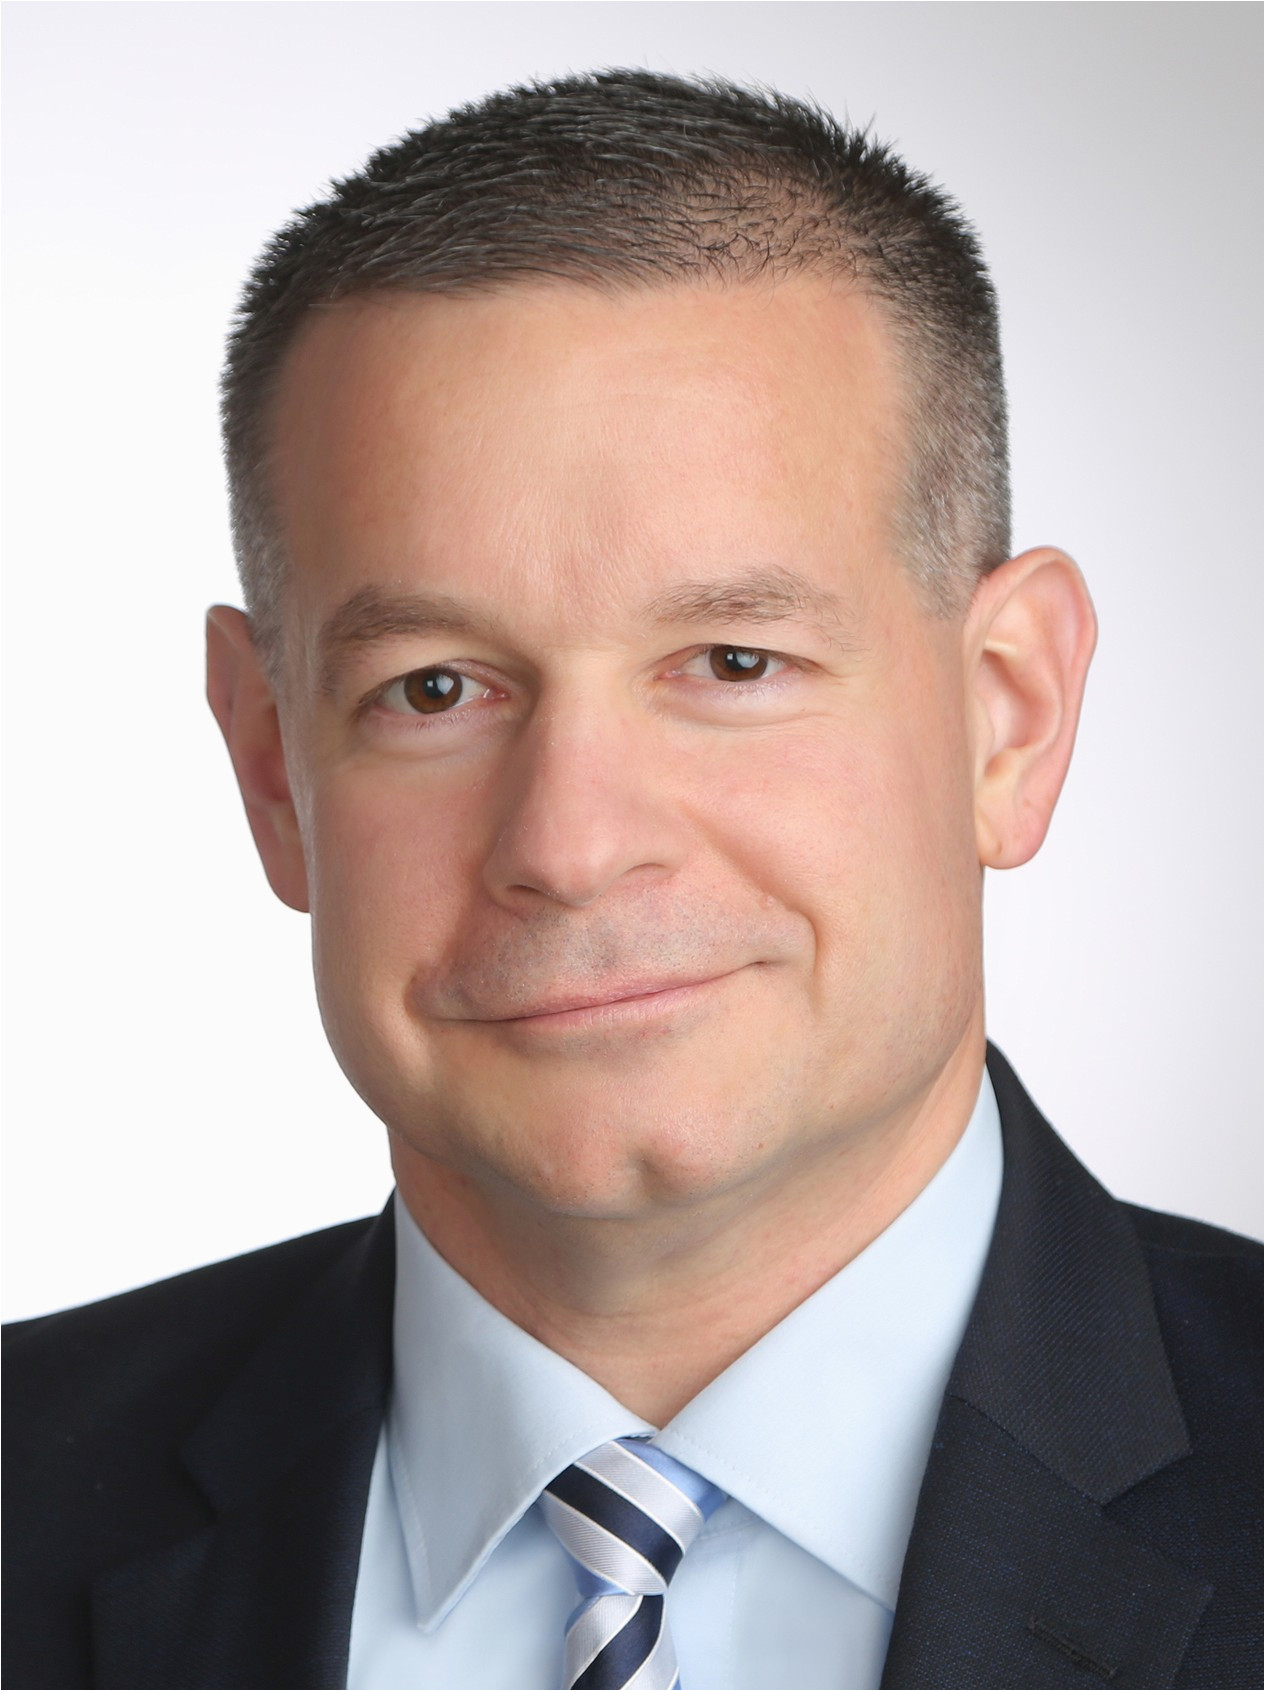 Joachim Englisch Lebenslauf Joachim Bös Lebenslauf Curriculum Vitae Resume